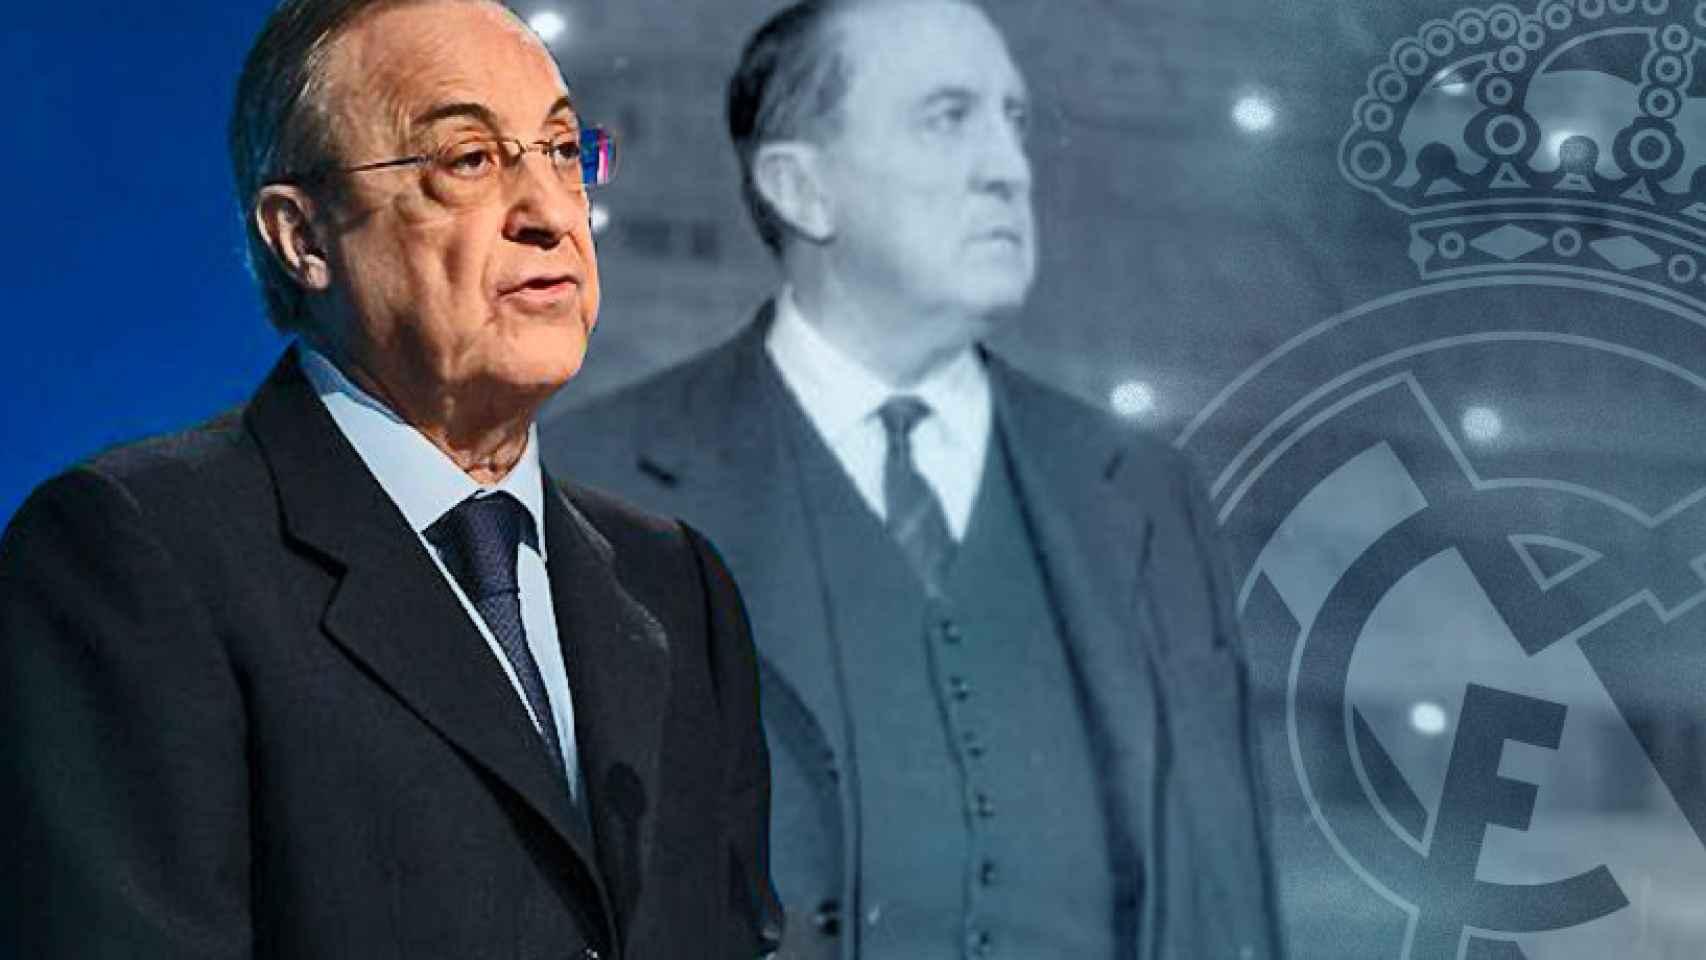 Florentino Pérez y Santiago Bernabéu